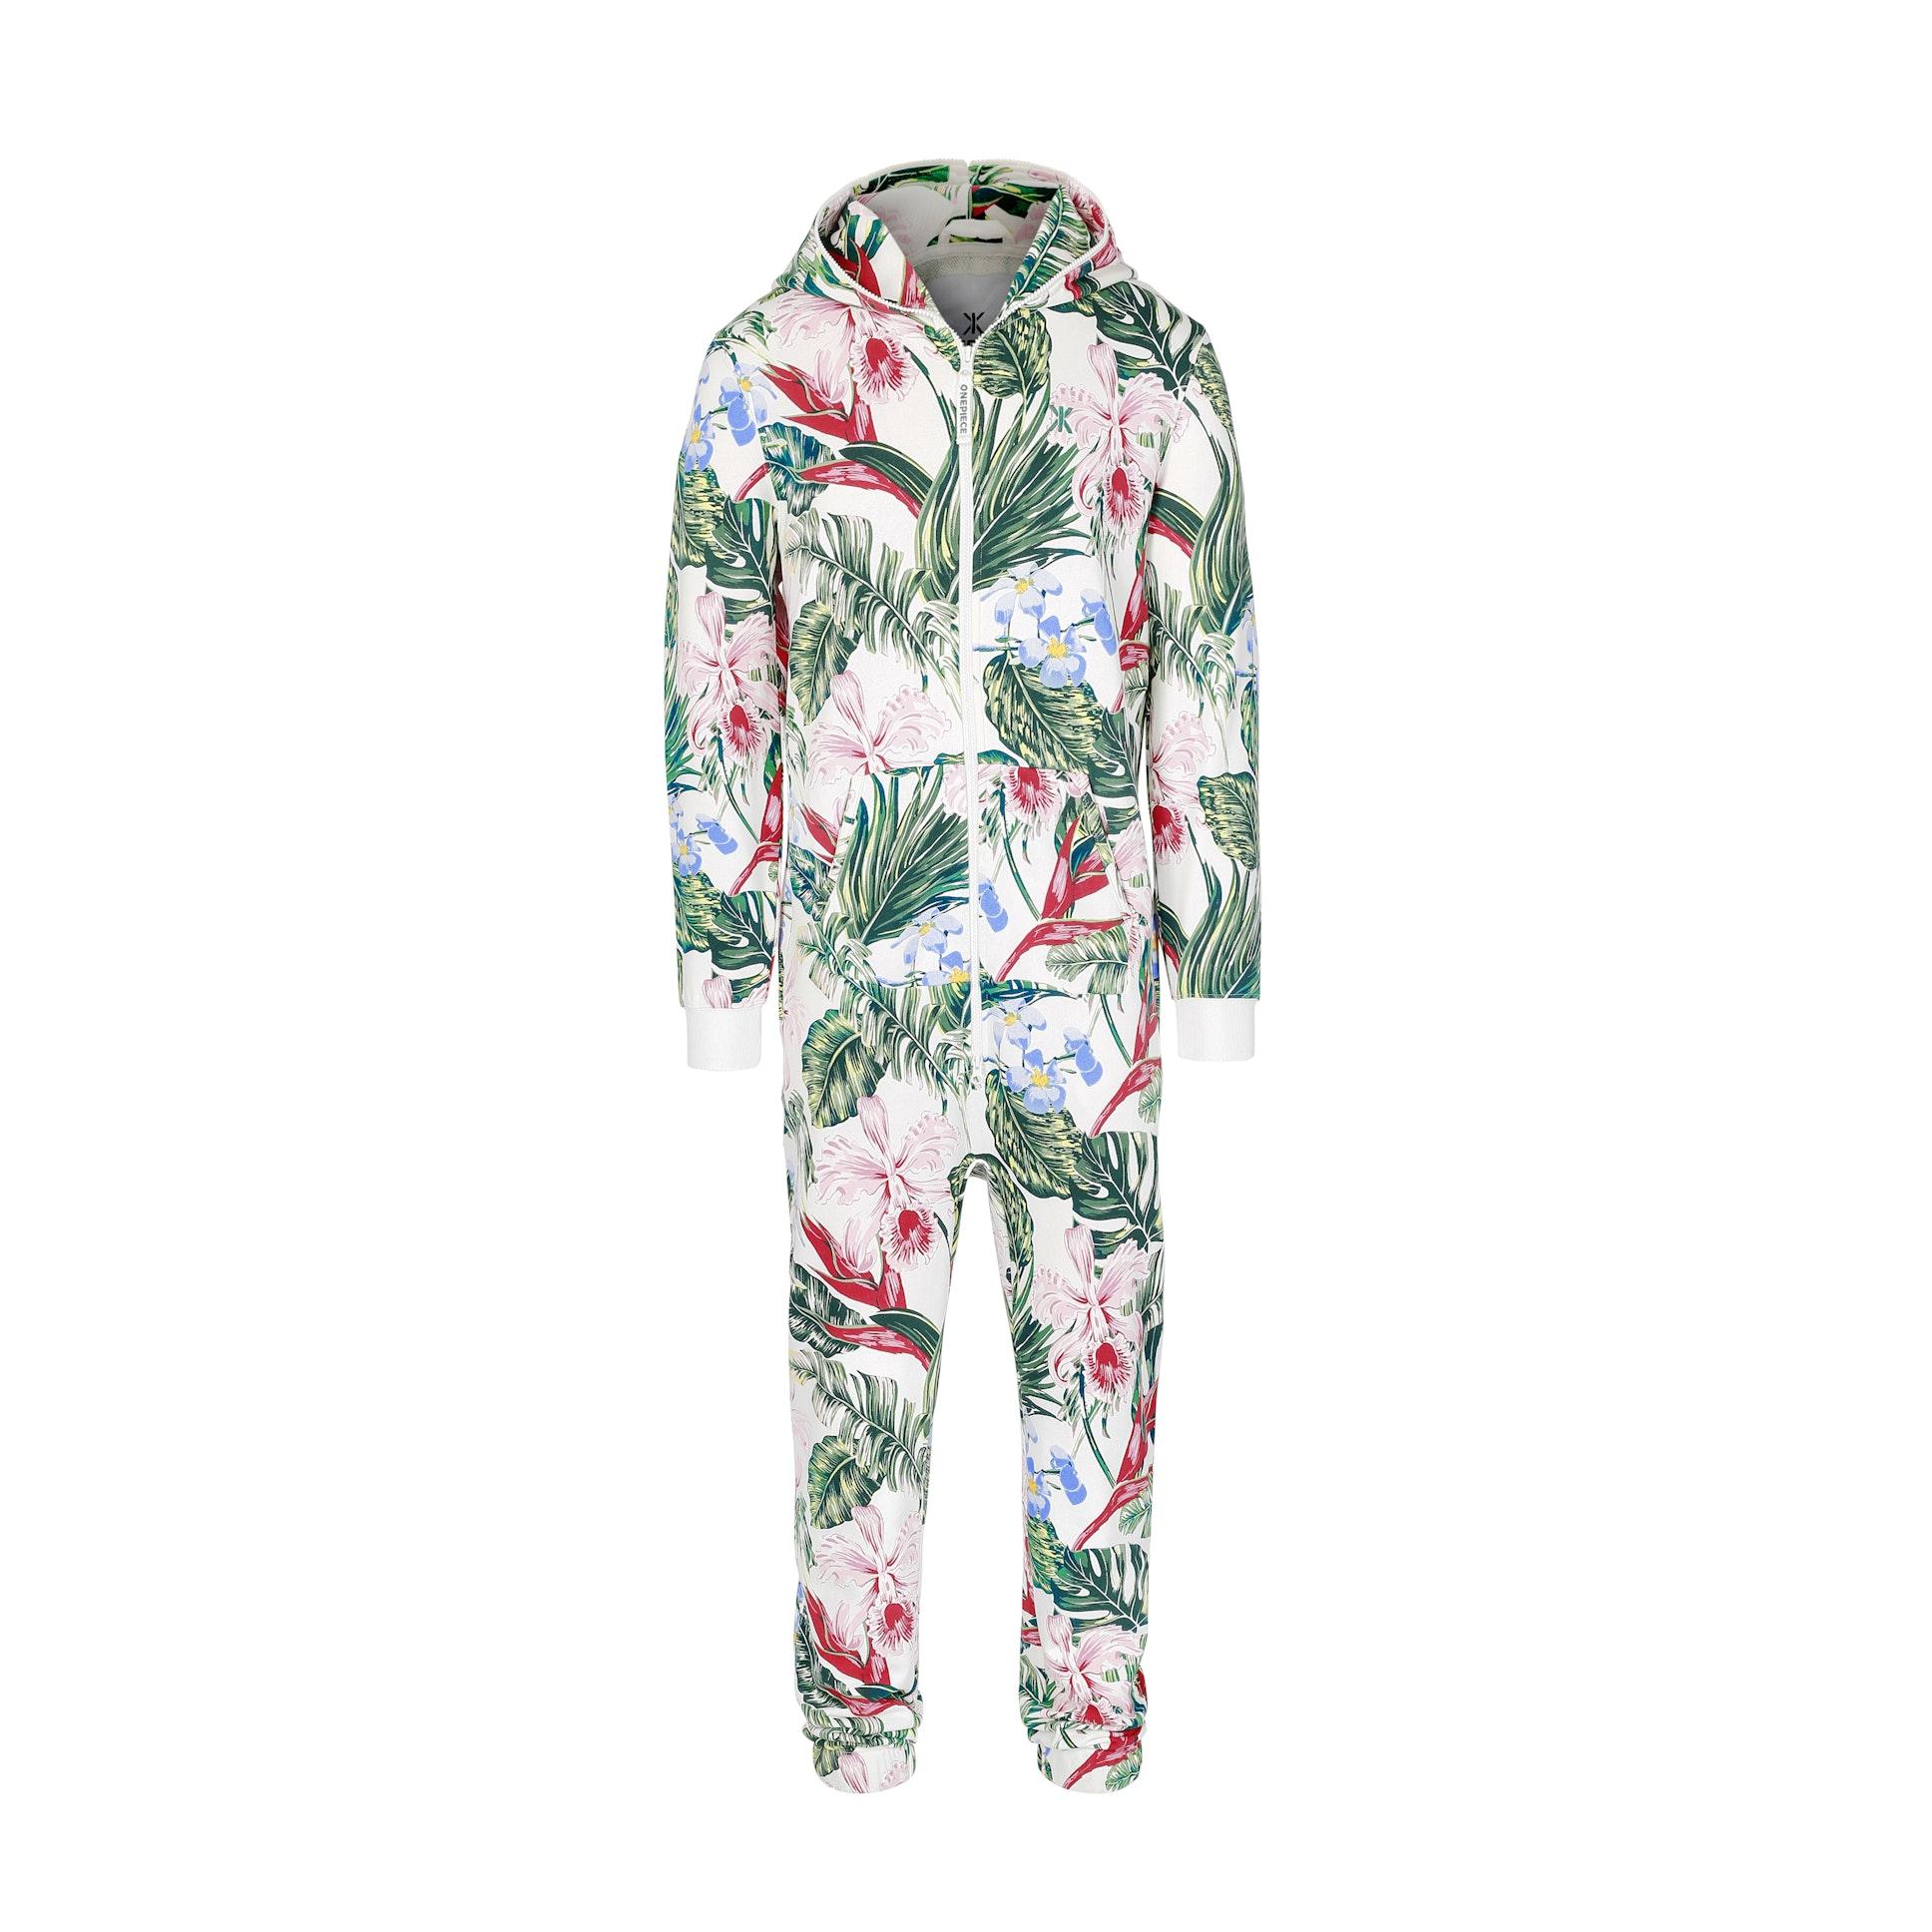 tropicana jumpsuit off-white